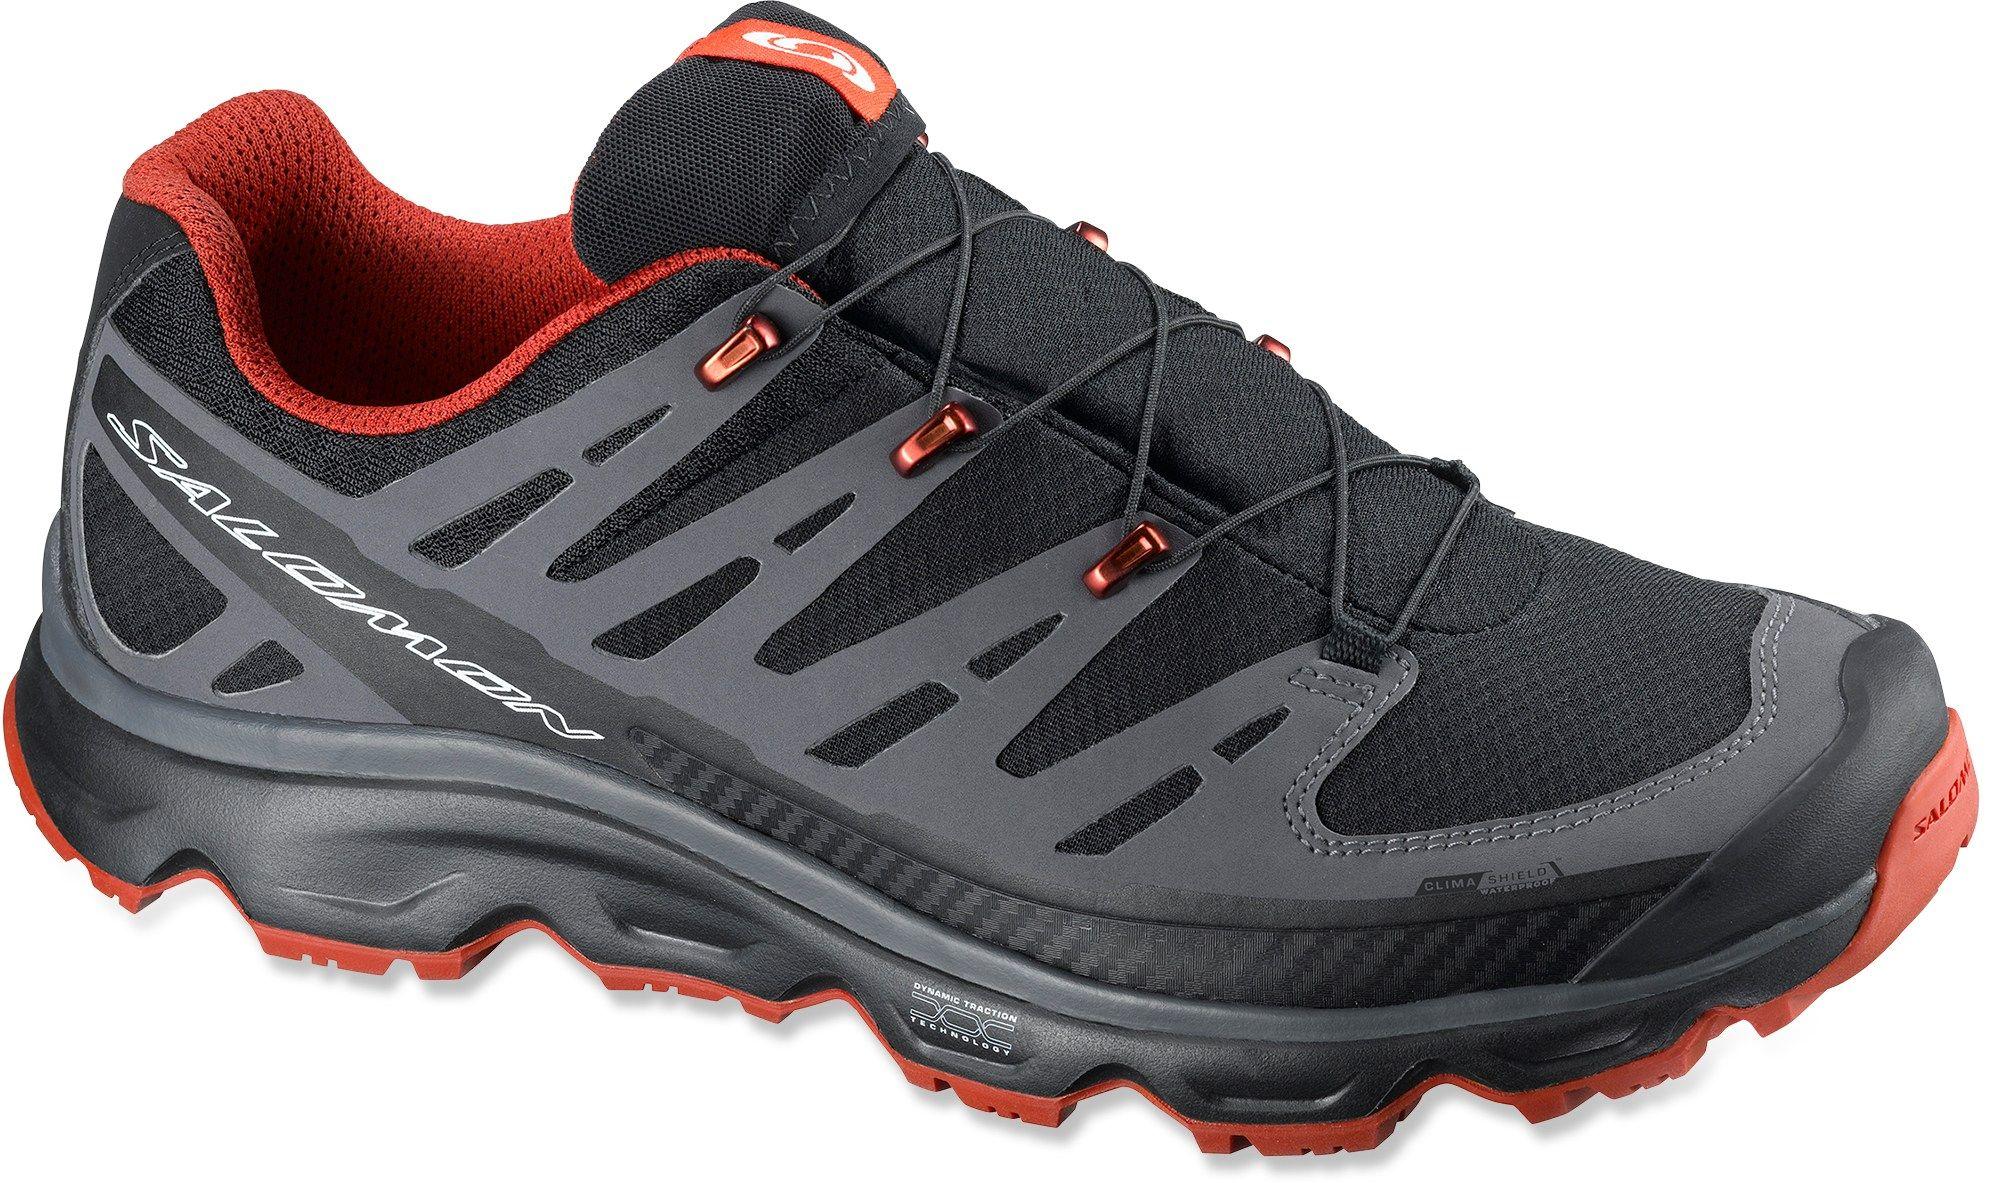 Salomon Synapse CS WP Hiking Shoes - Men's - Free Shipping at REI.com